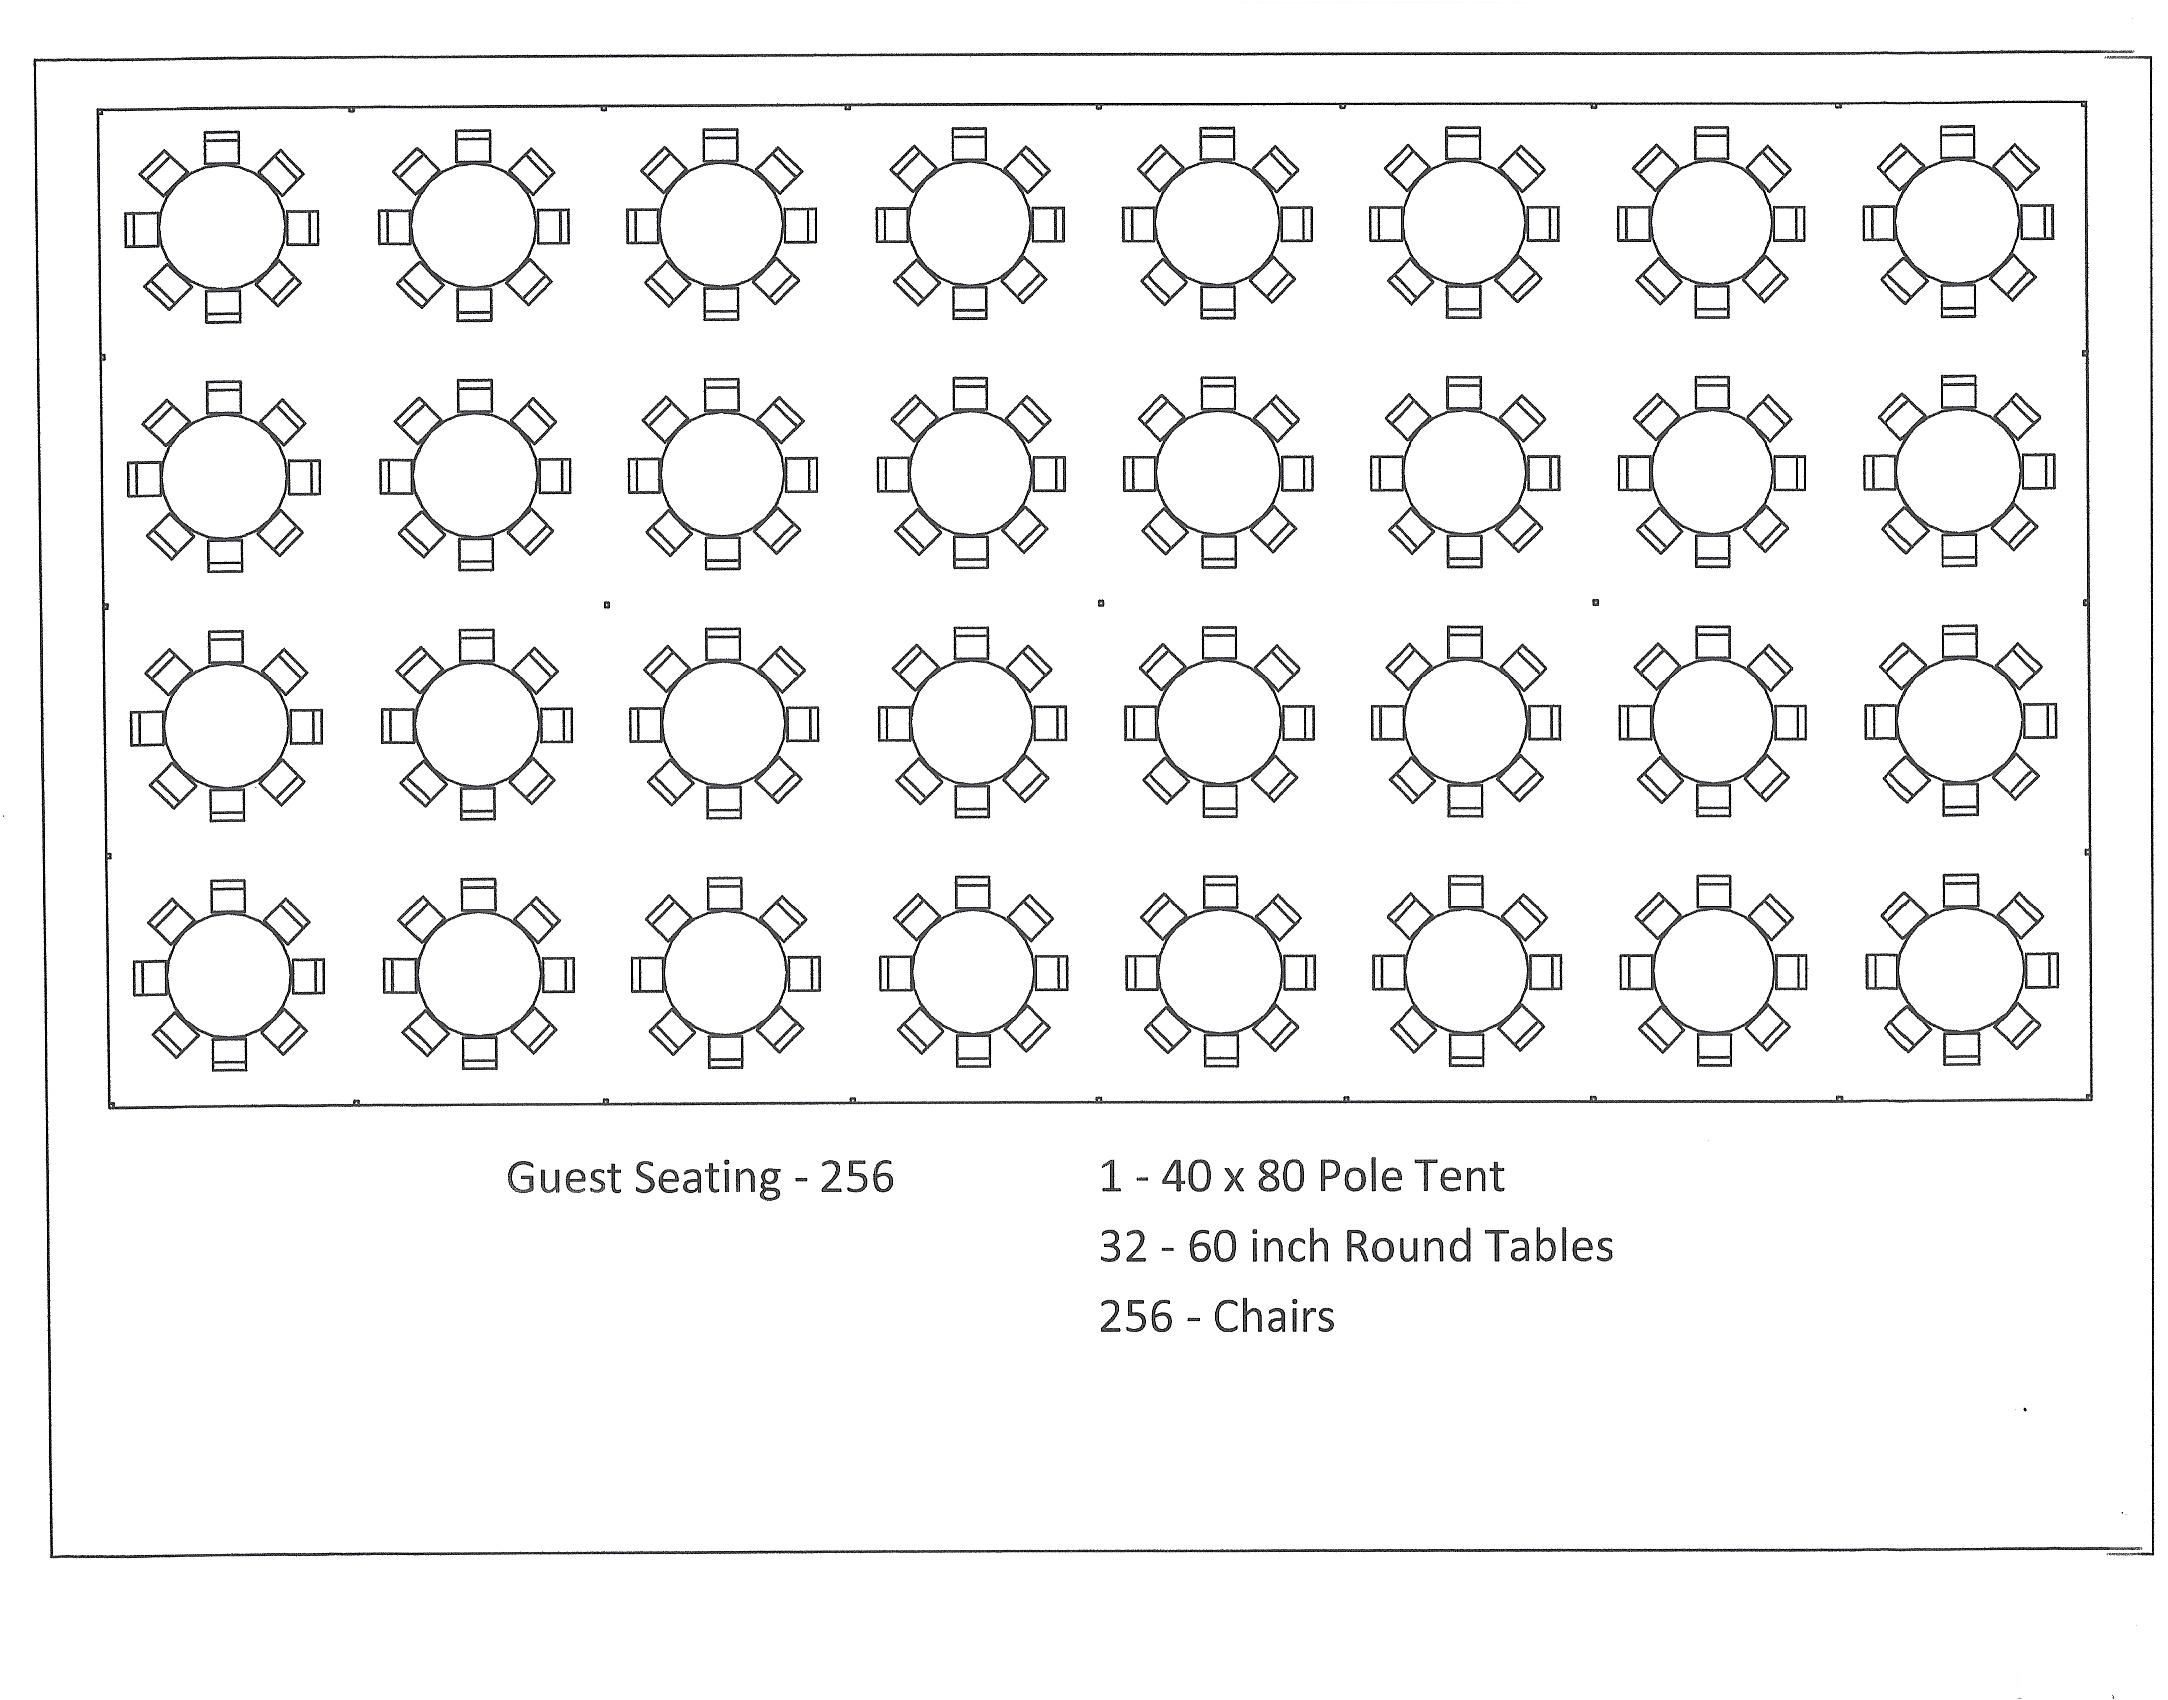 40 X 80 Pole Tent Seating Arrangements